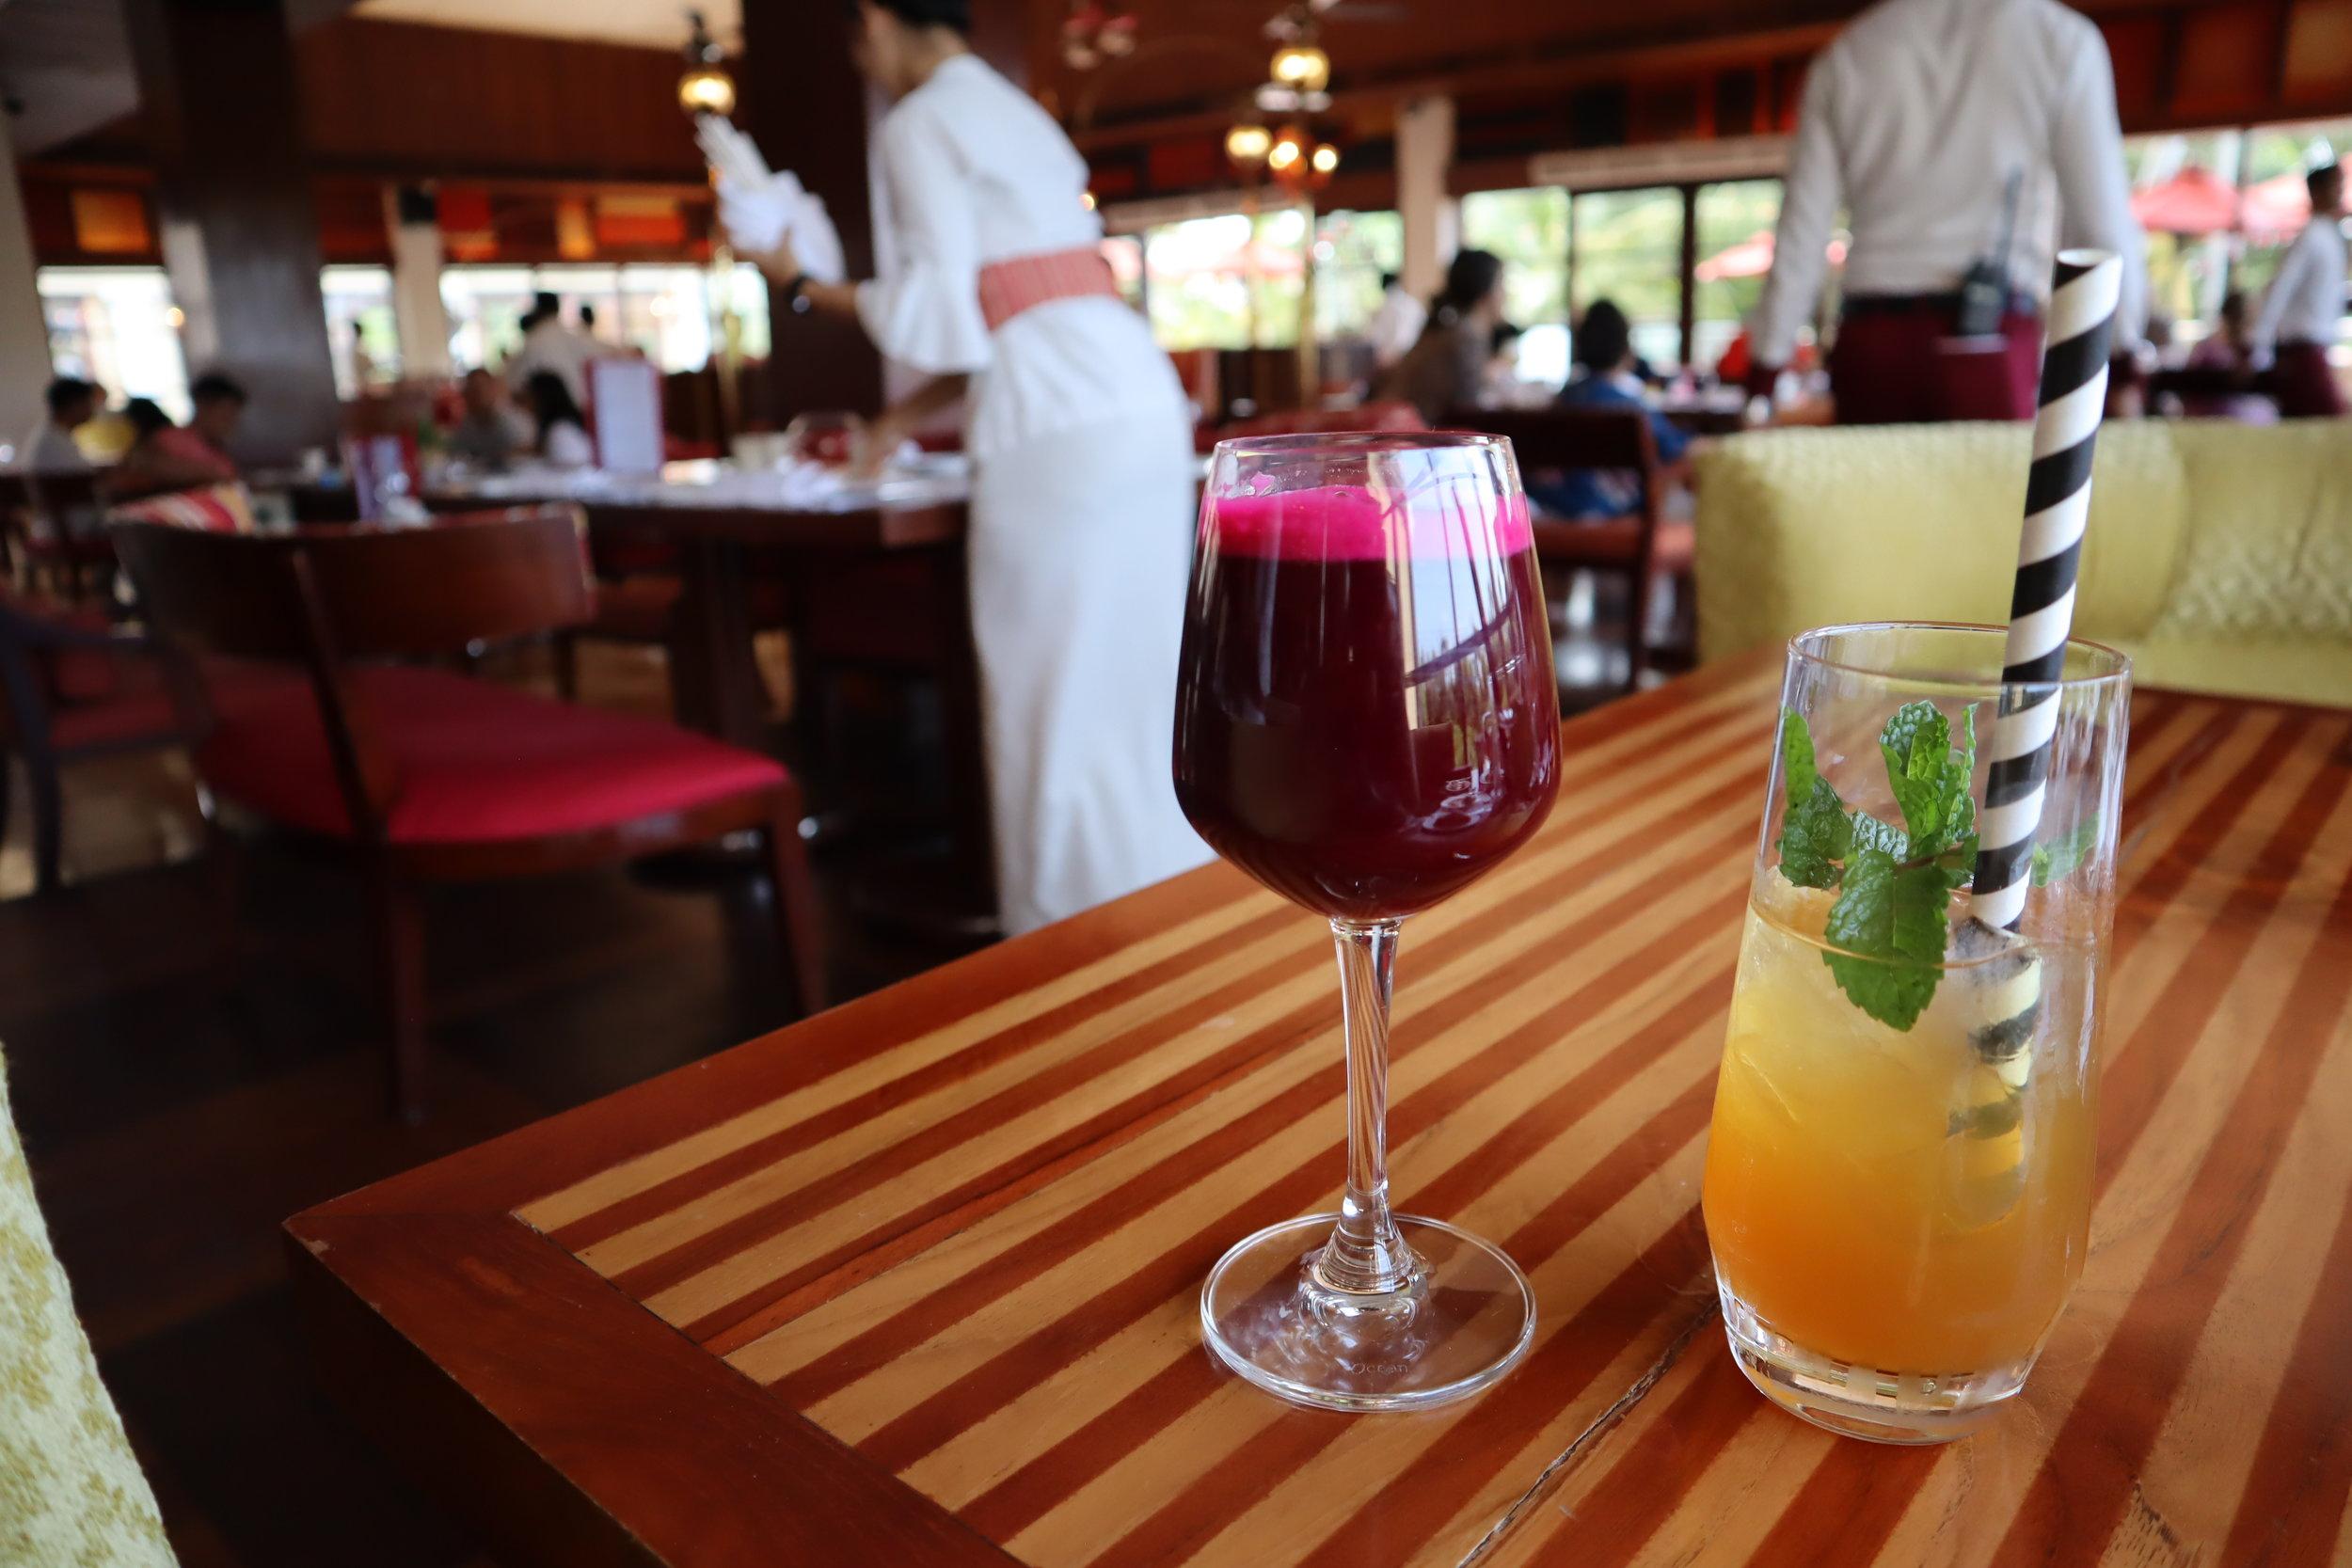 St. Regis Bali – Berry smoothie and St. Regis ice tea